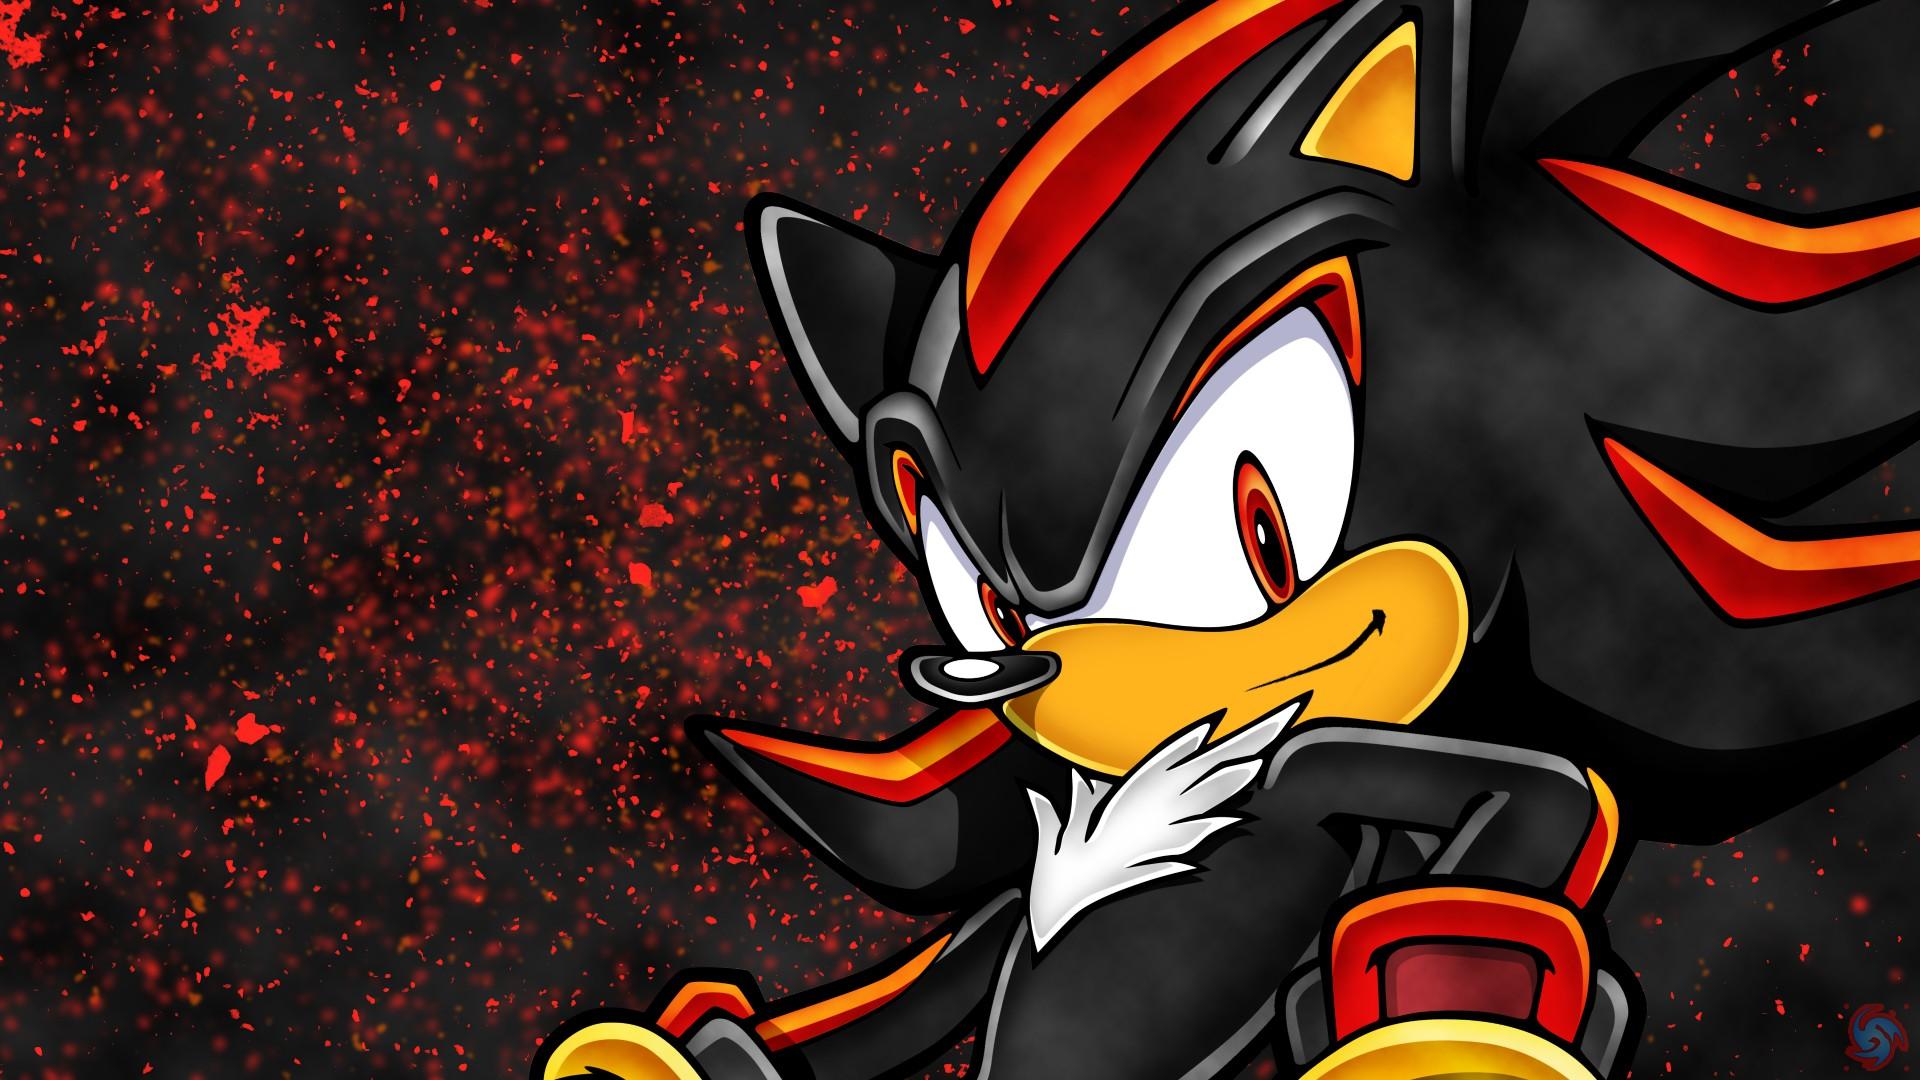 Shadow The Hedgehog Wallpaper ① Download Free Beautiful Hd